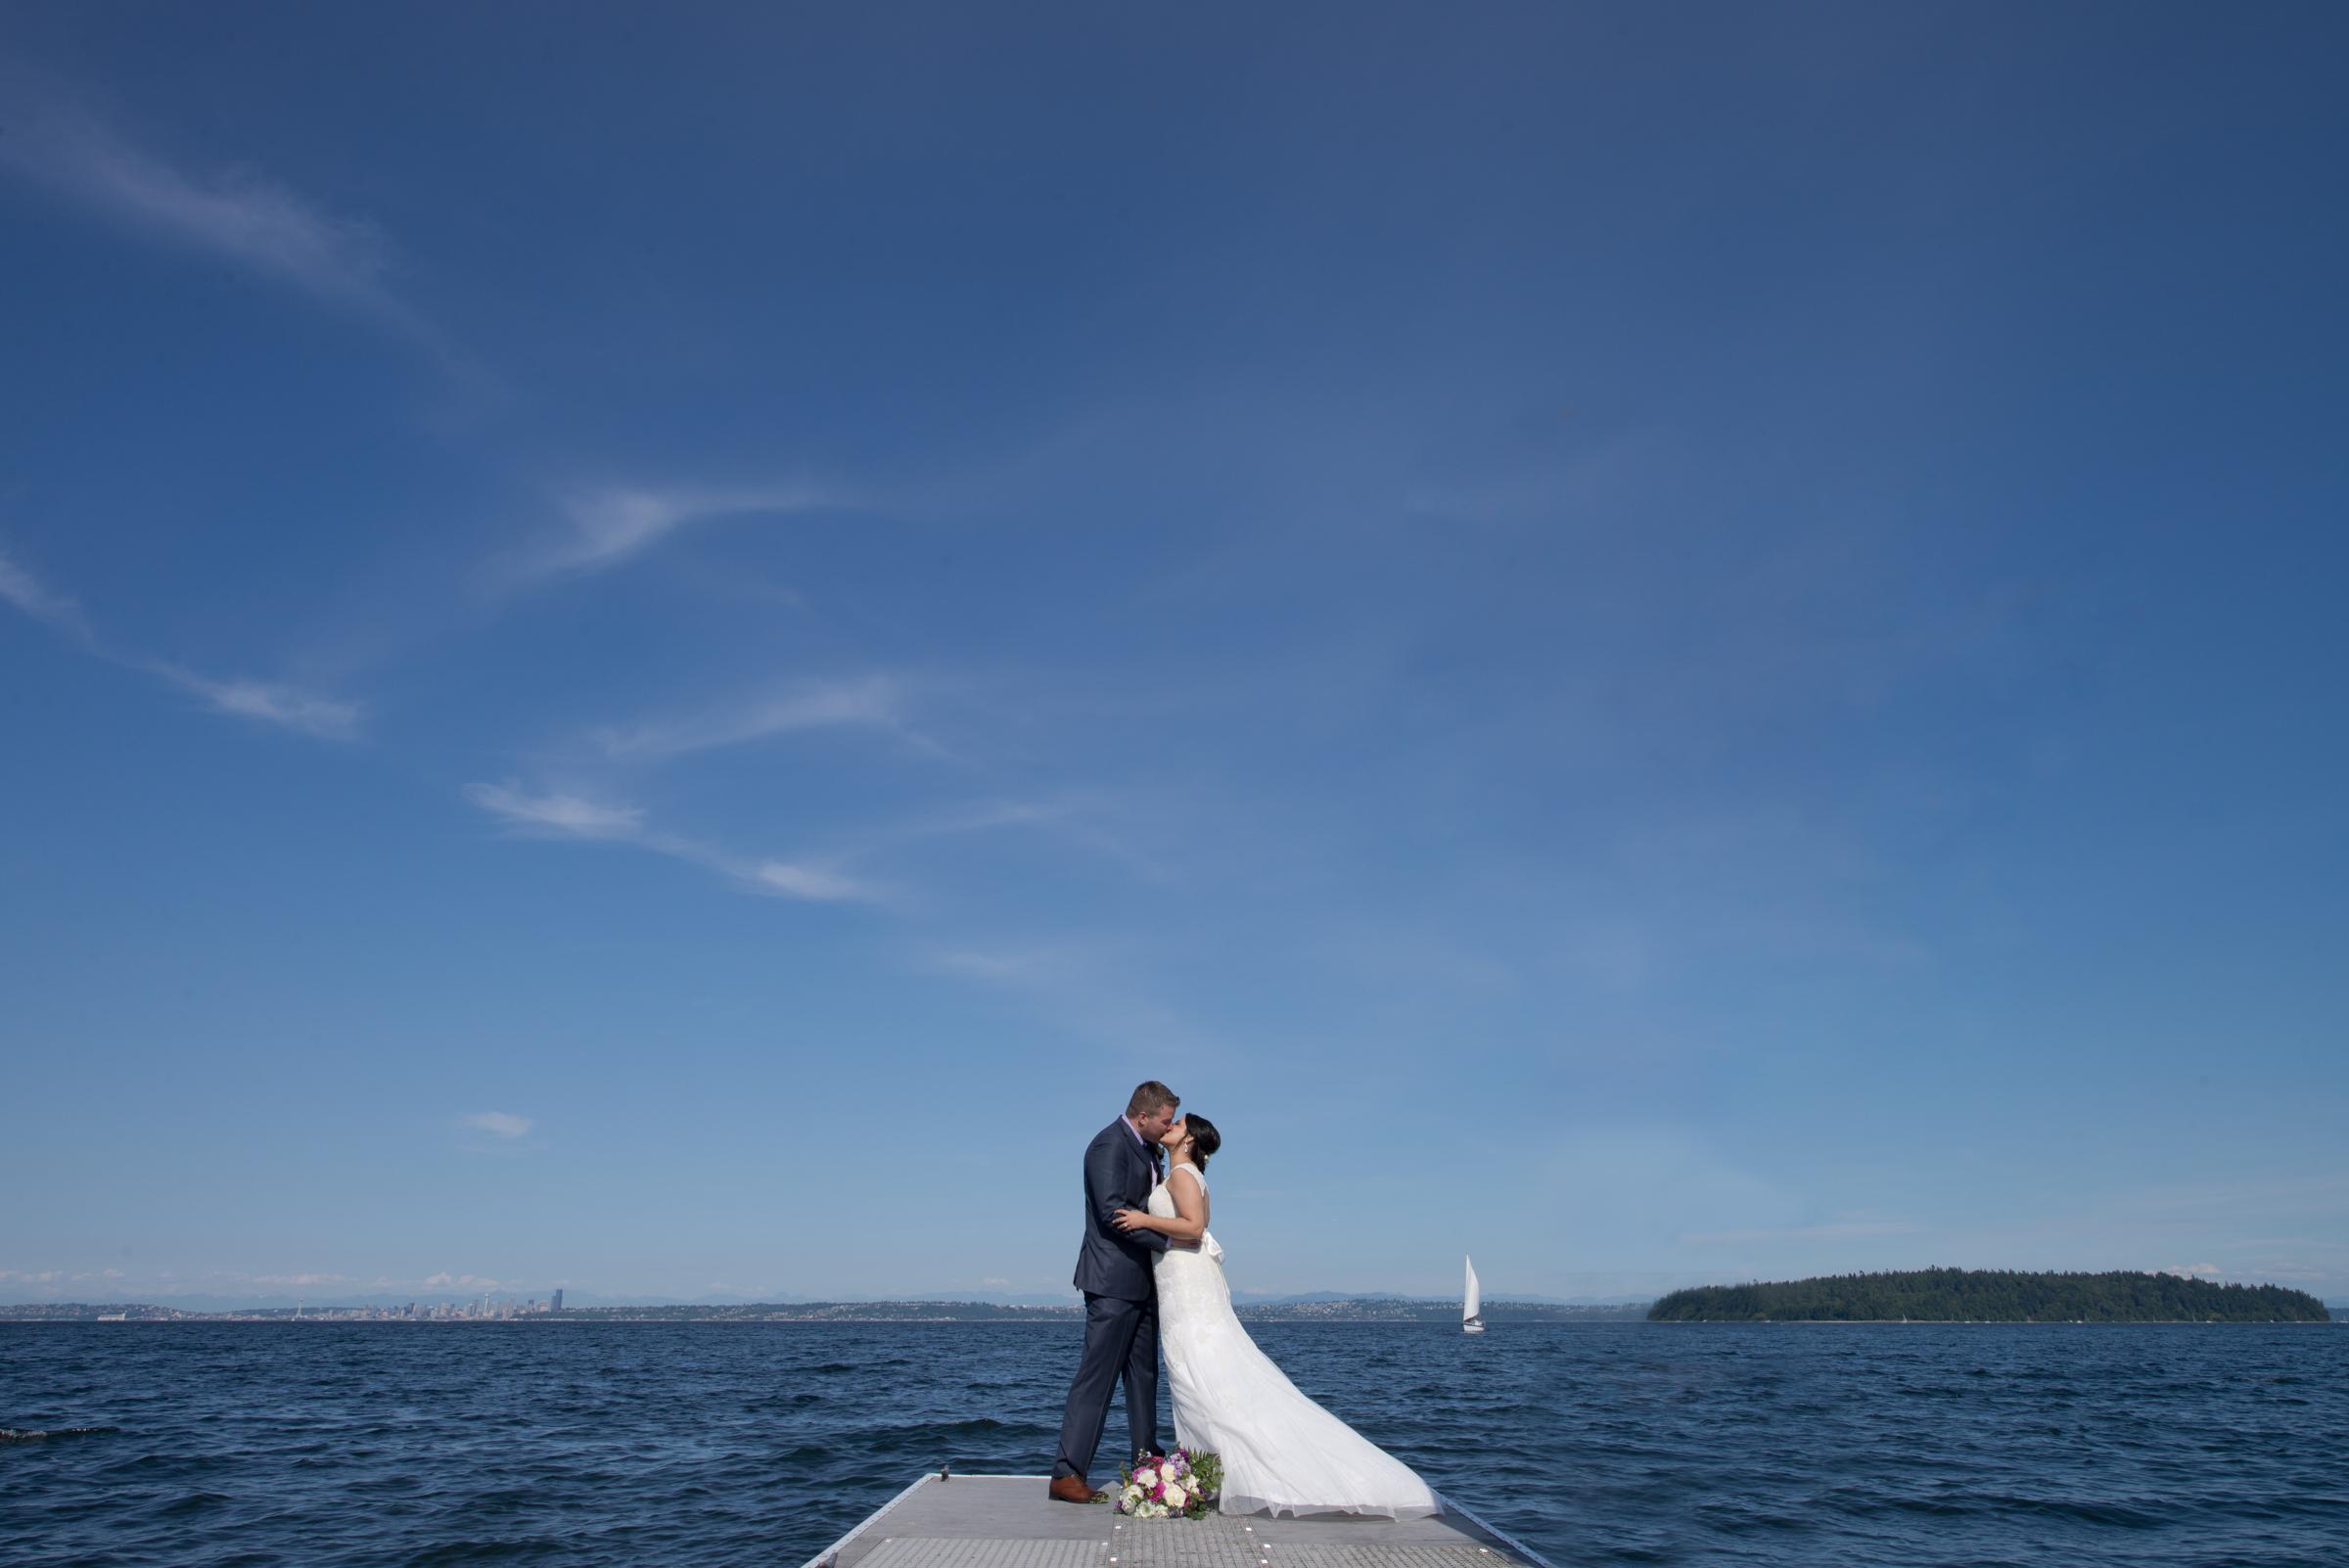 Wedding bridge & groom on a dock